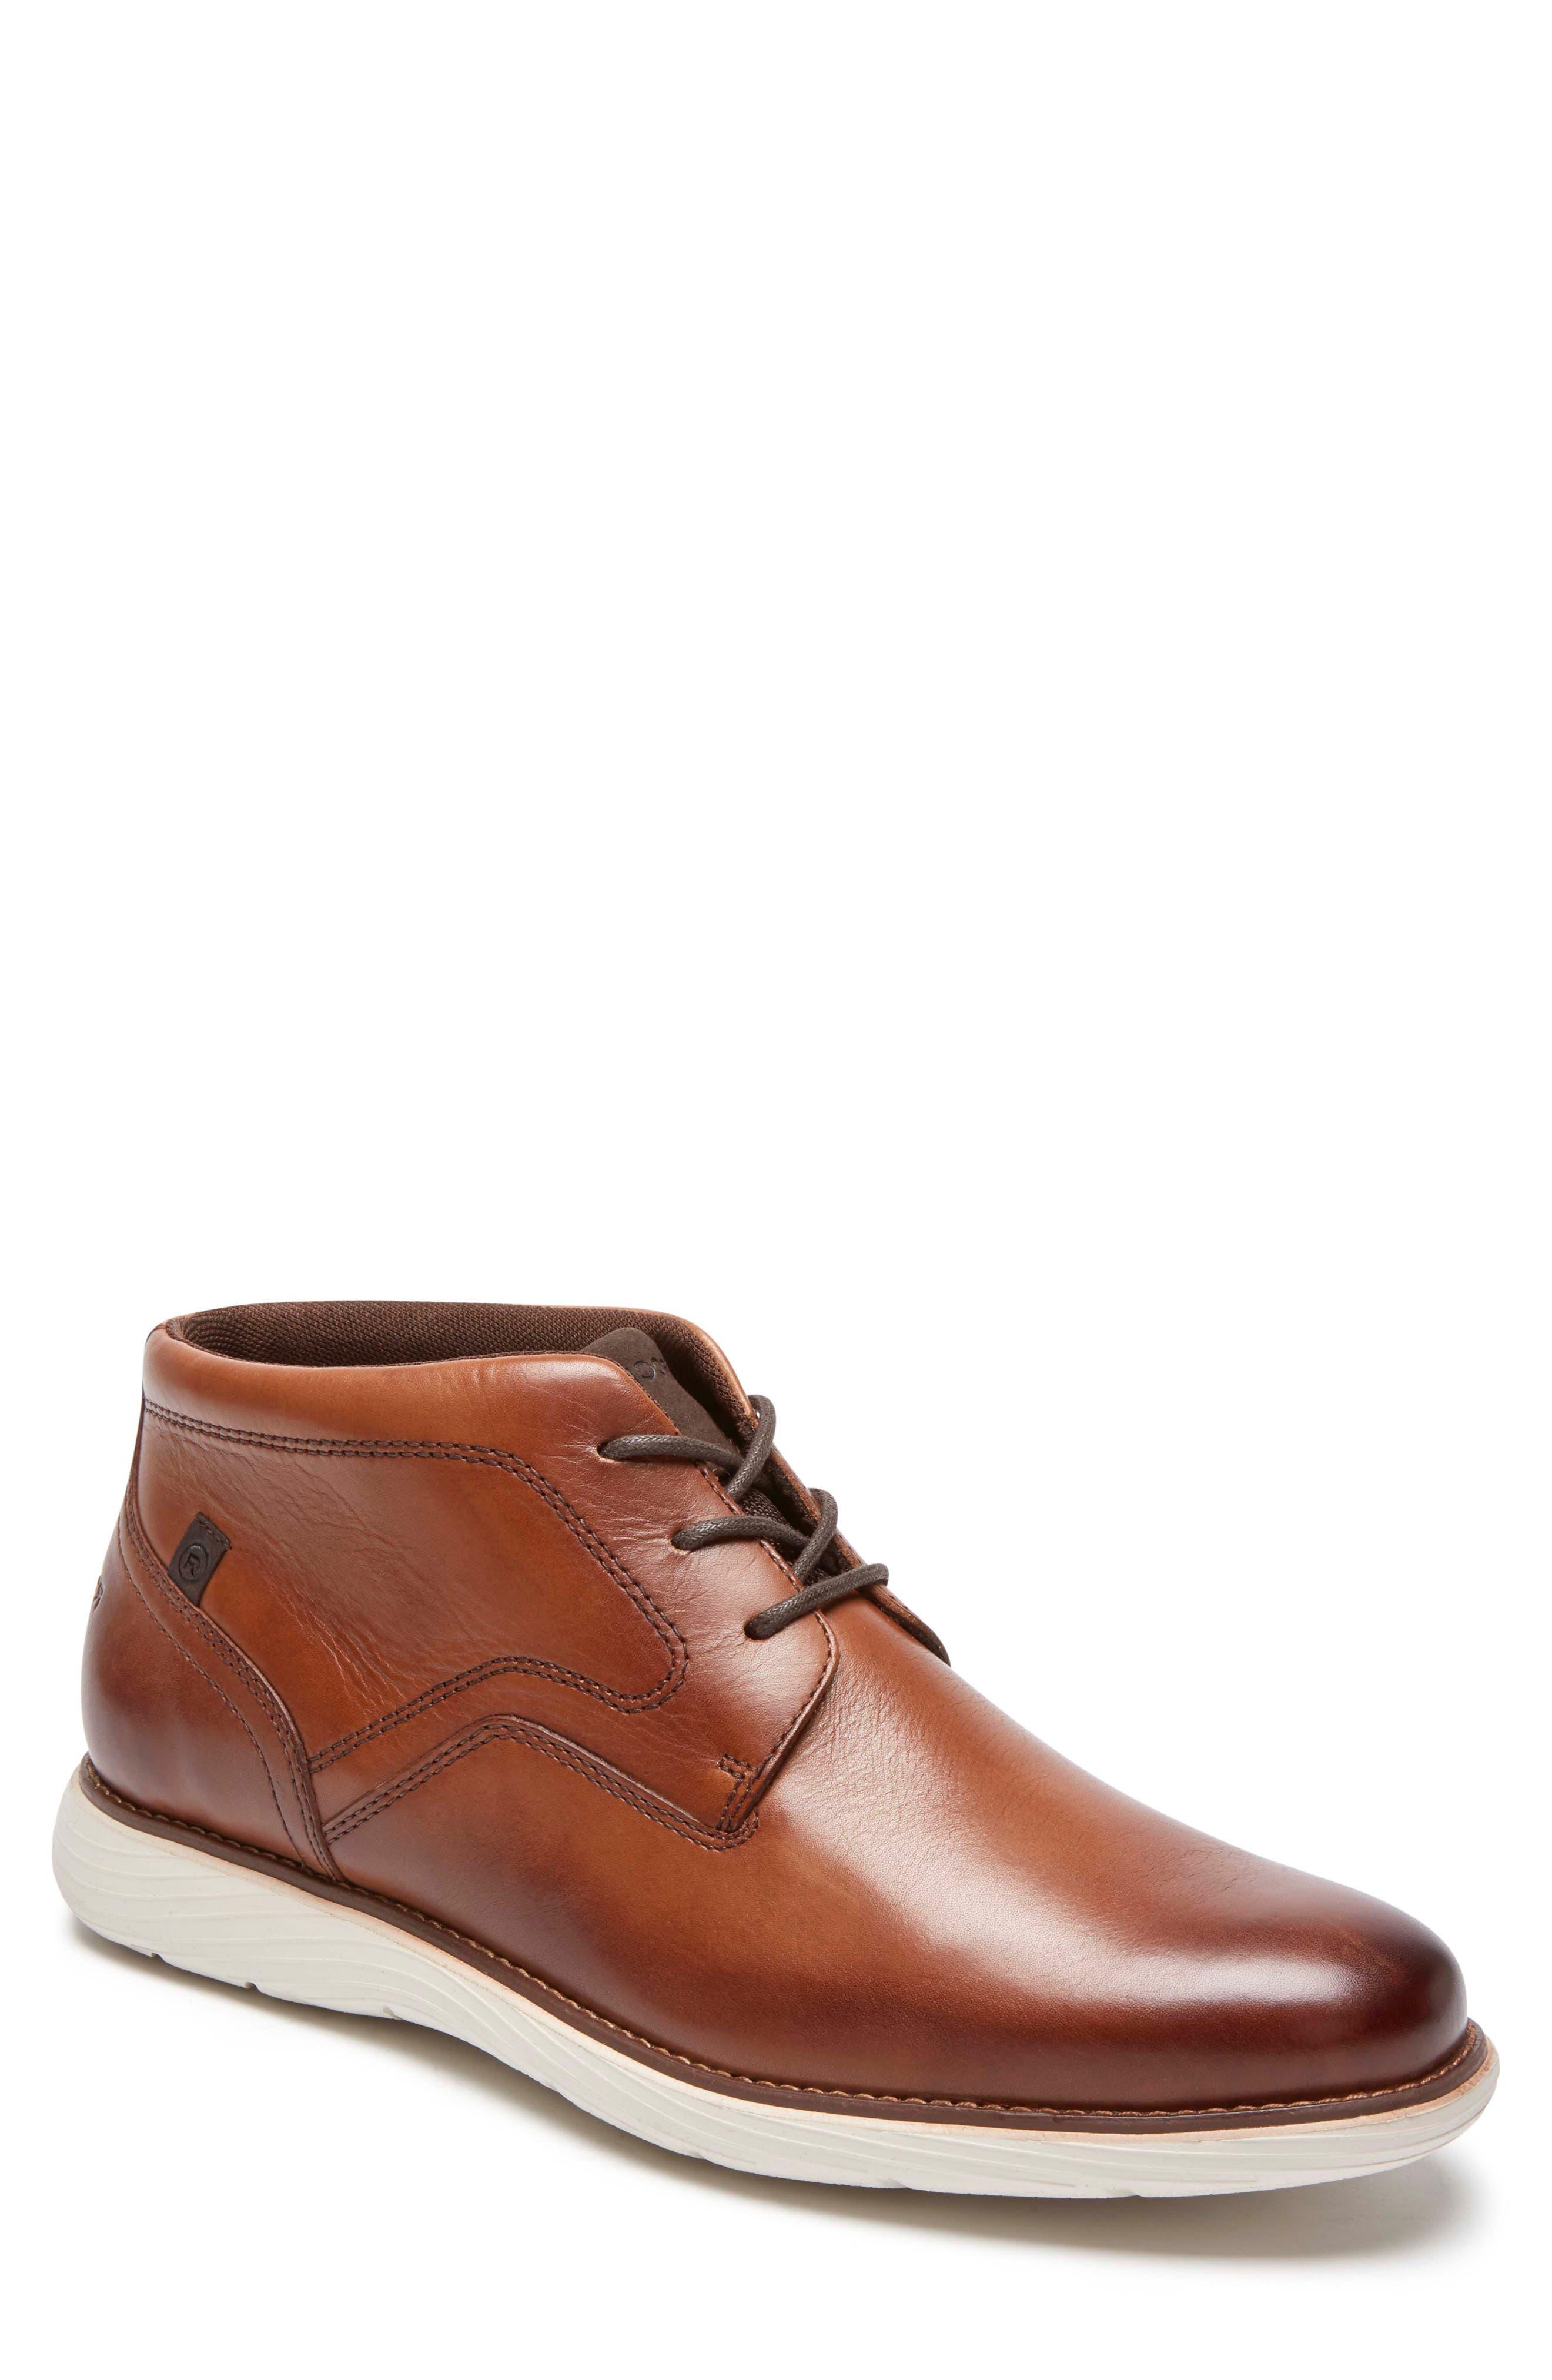 Rockport Kessler Chukka Boot, Brown